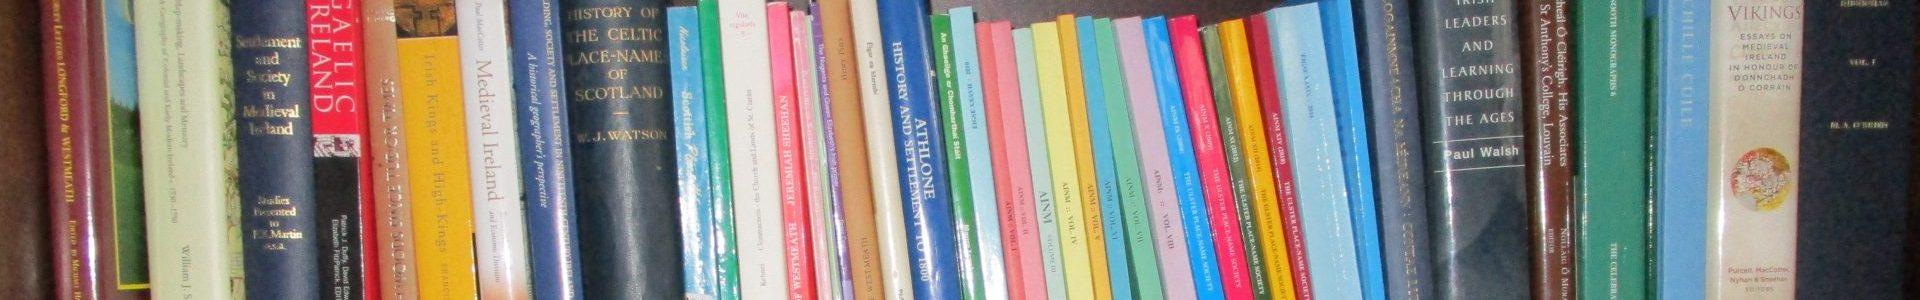 cropped-Bookshelf.jpg